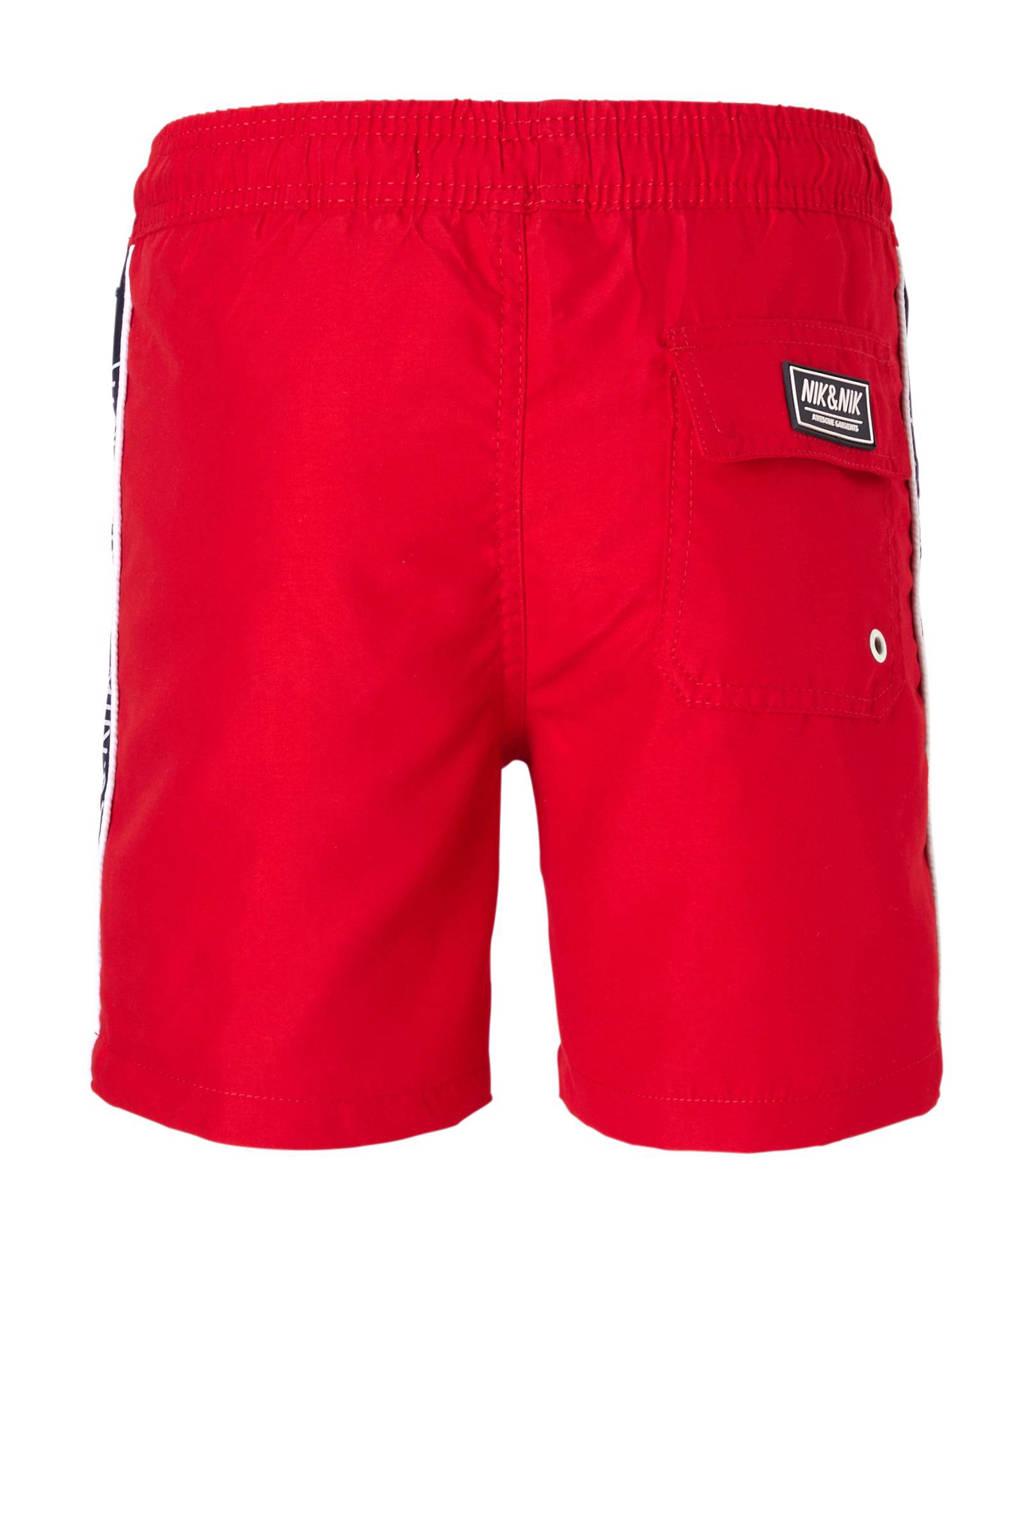 NIK&NIK zwemshort, Rood/wit/blauw